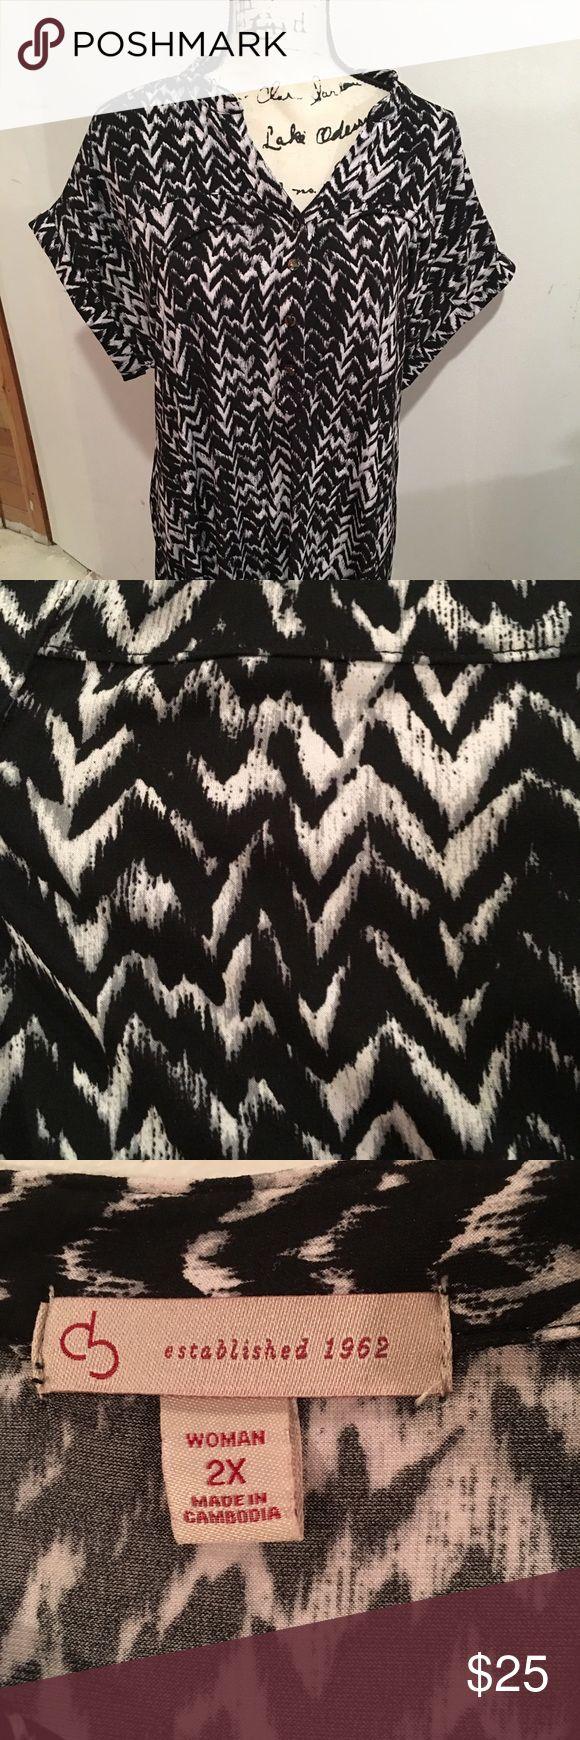 Woman's tunic Very cute tunic, black and white chevron Tops Tunics